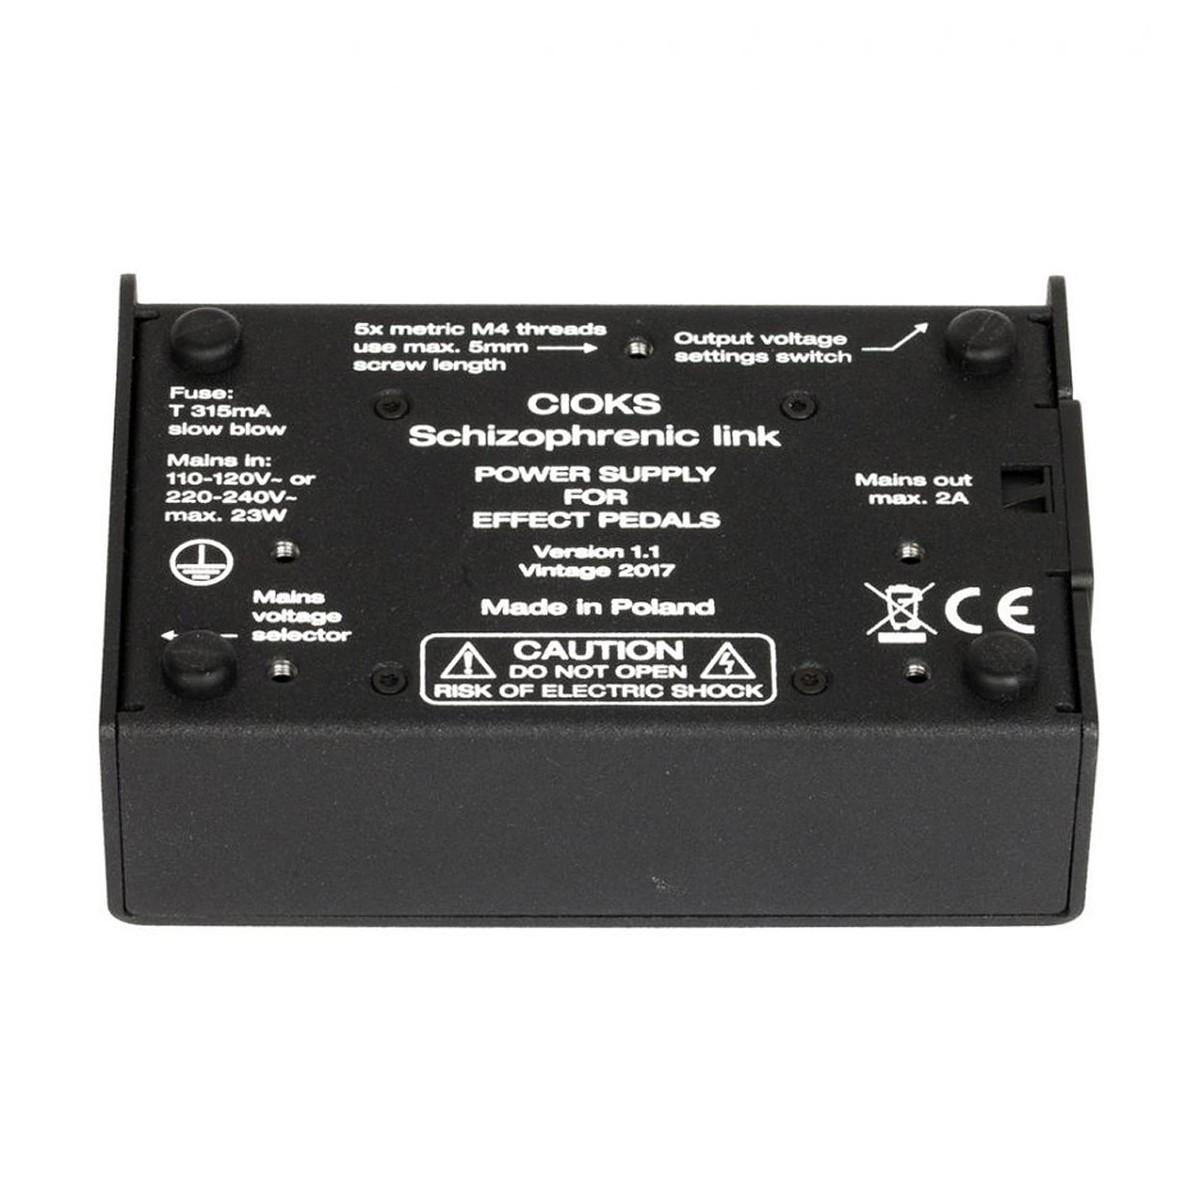 Cioks Schizophrenic Link Power Supply Box Opened At Gear4music Fuse